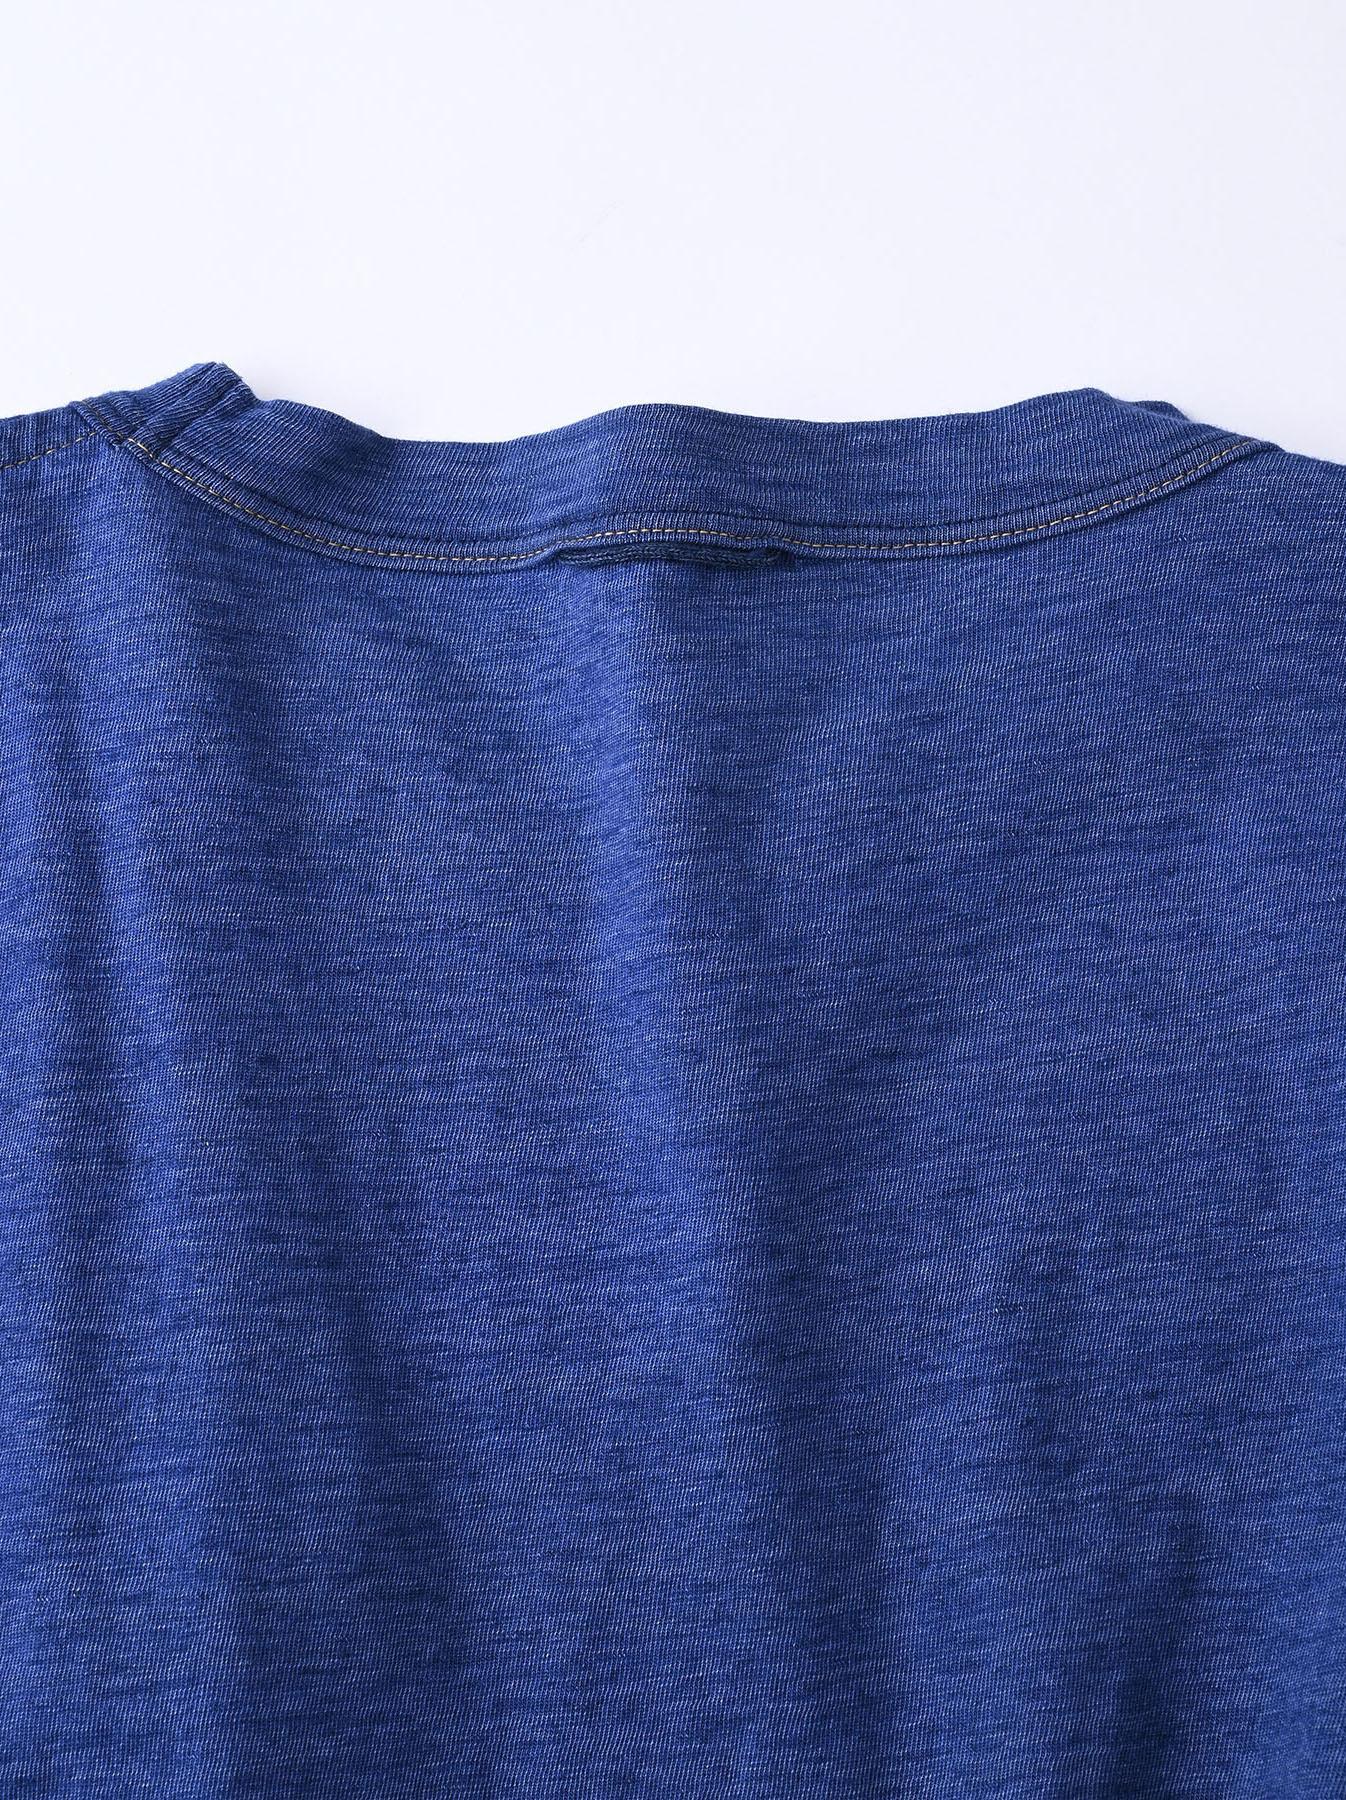 Distressed Indigo Ukiyo de Surf 908 Ocean T-shirt (0621)-10